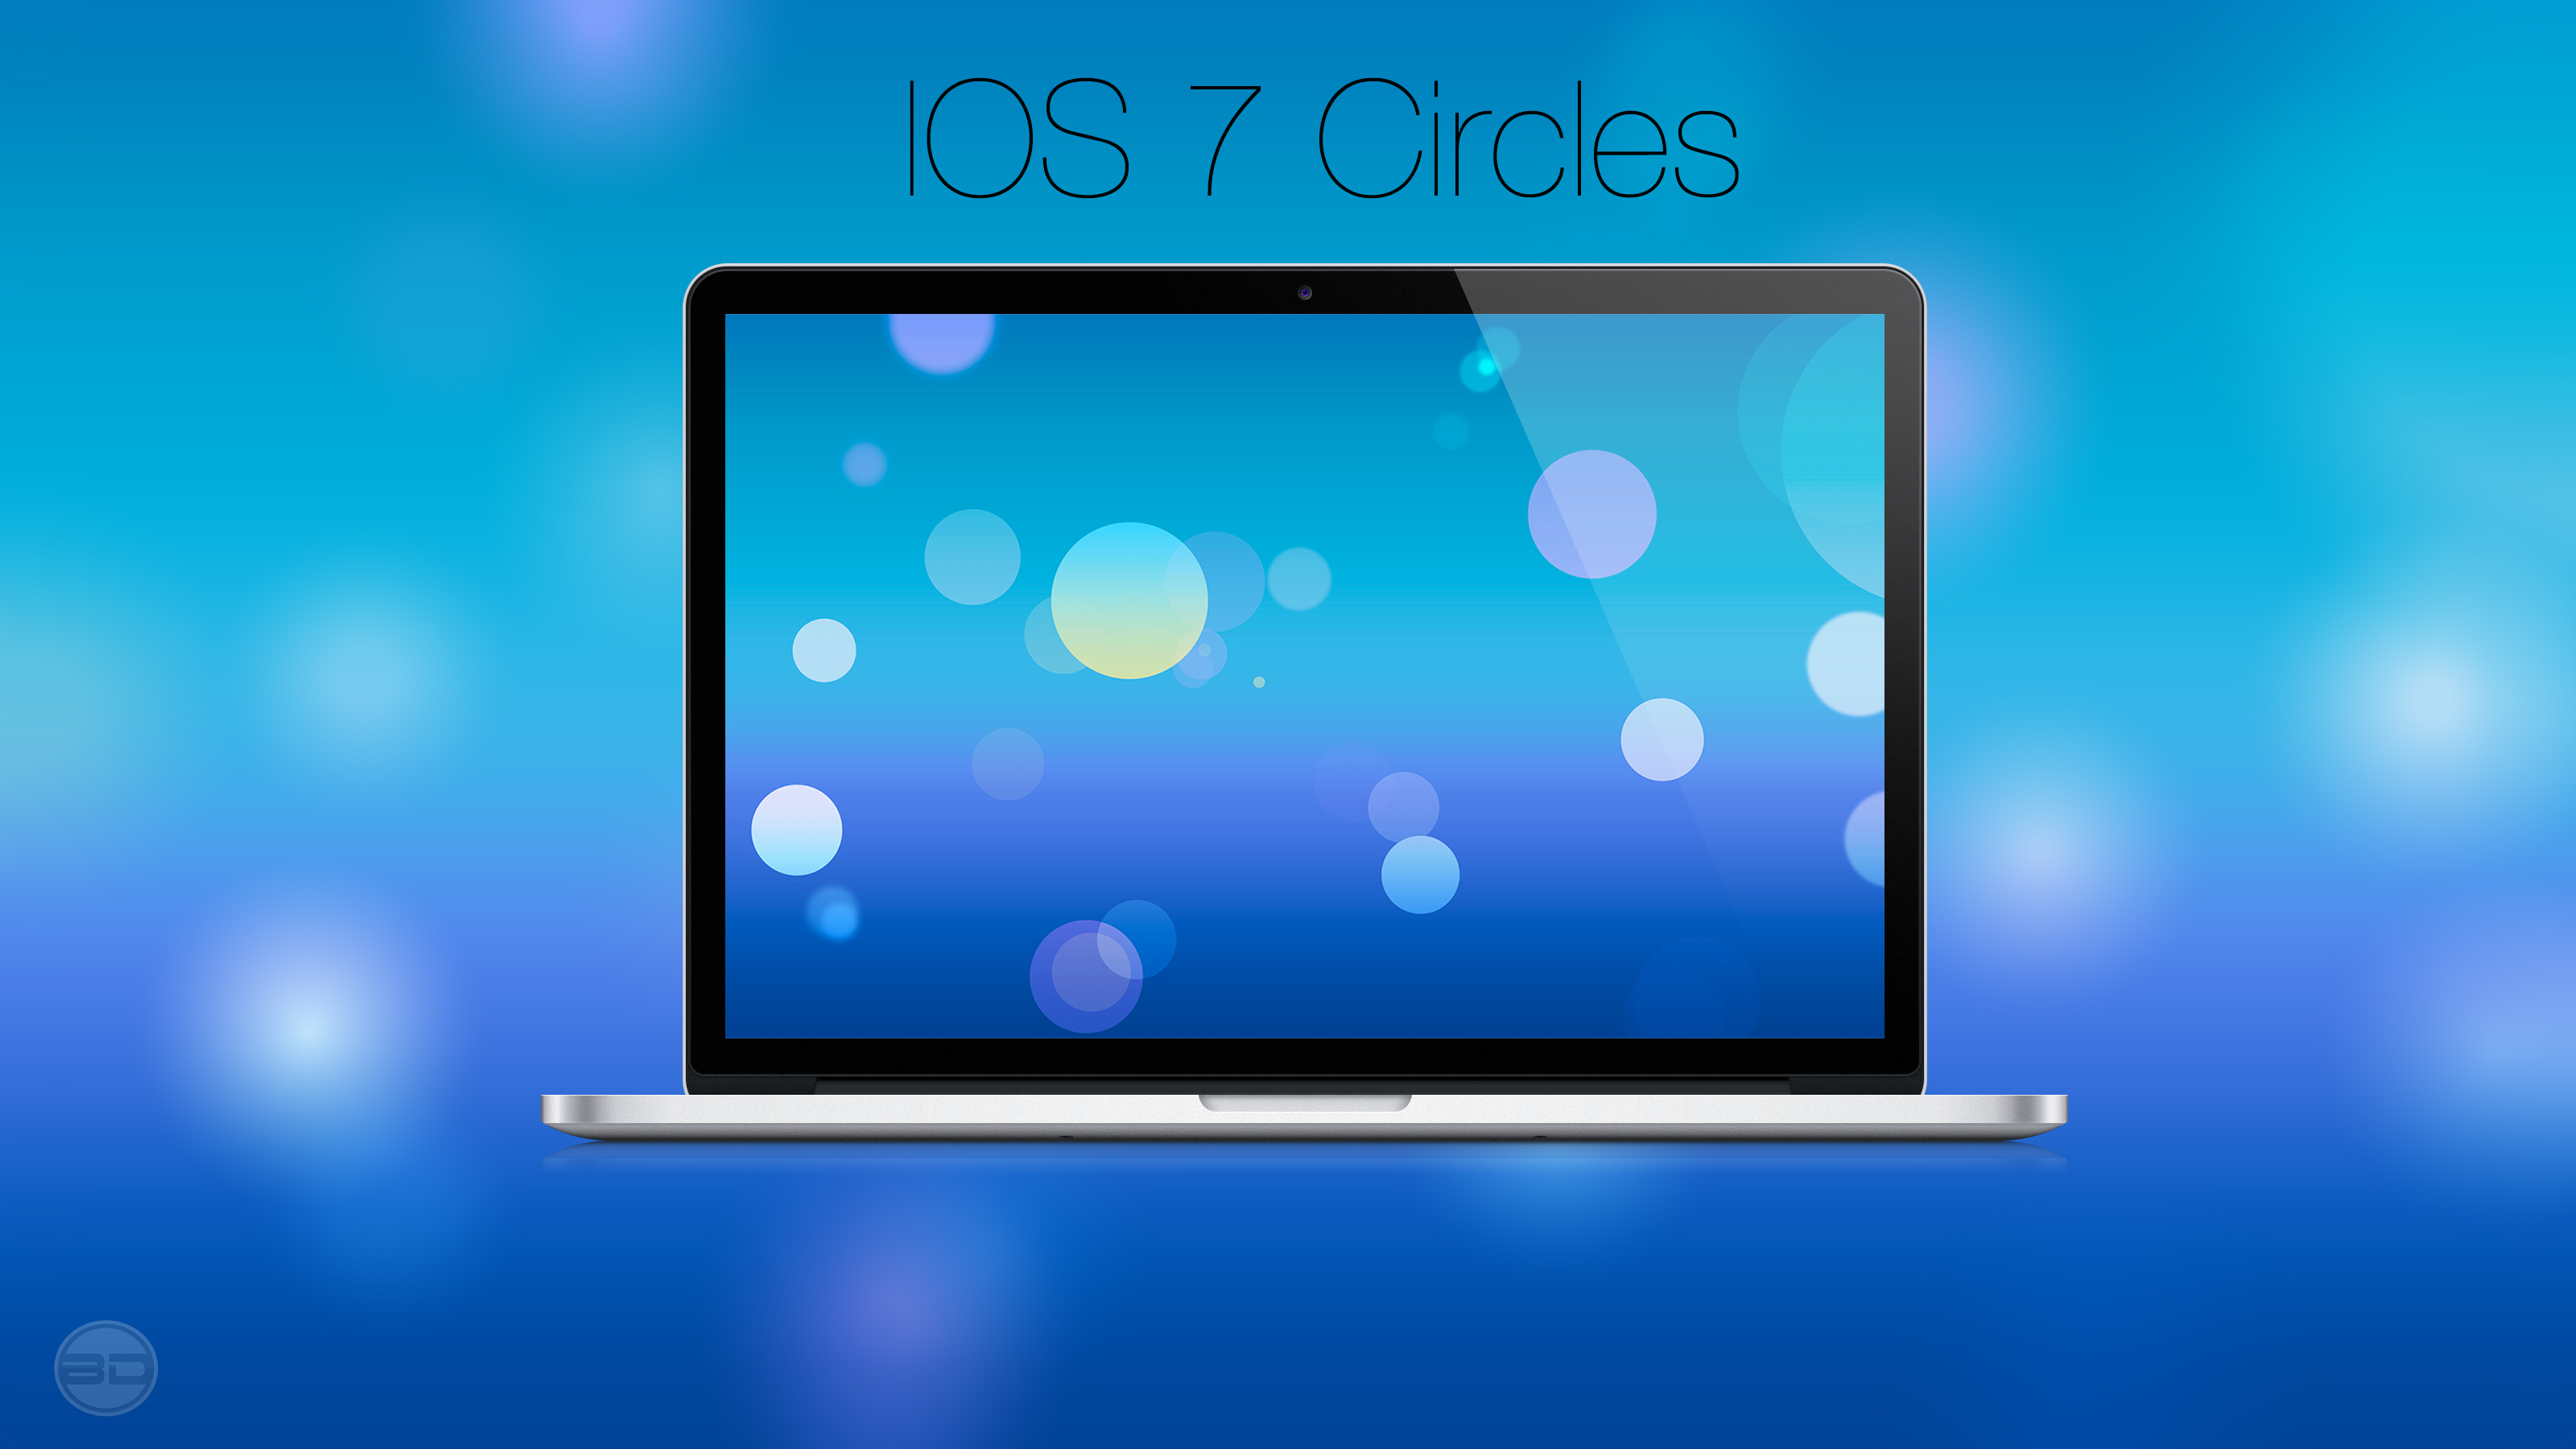 Ios 7 Circles